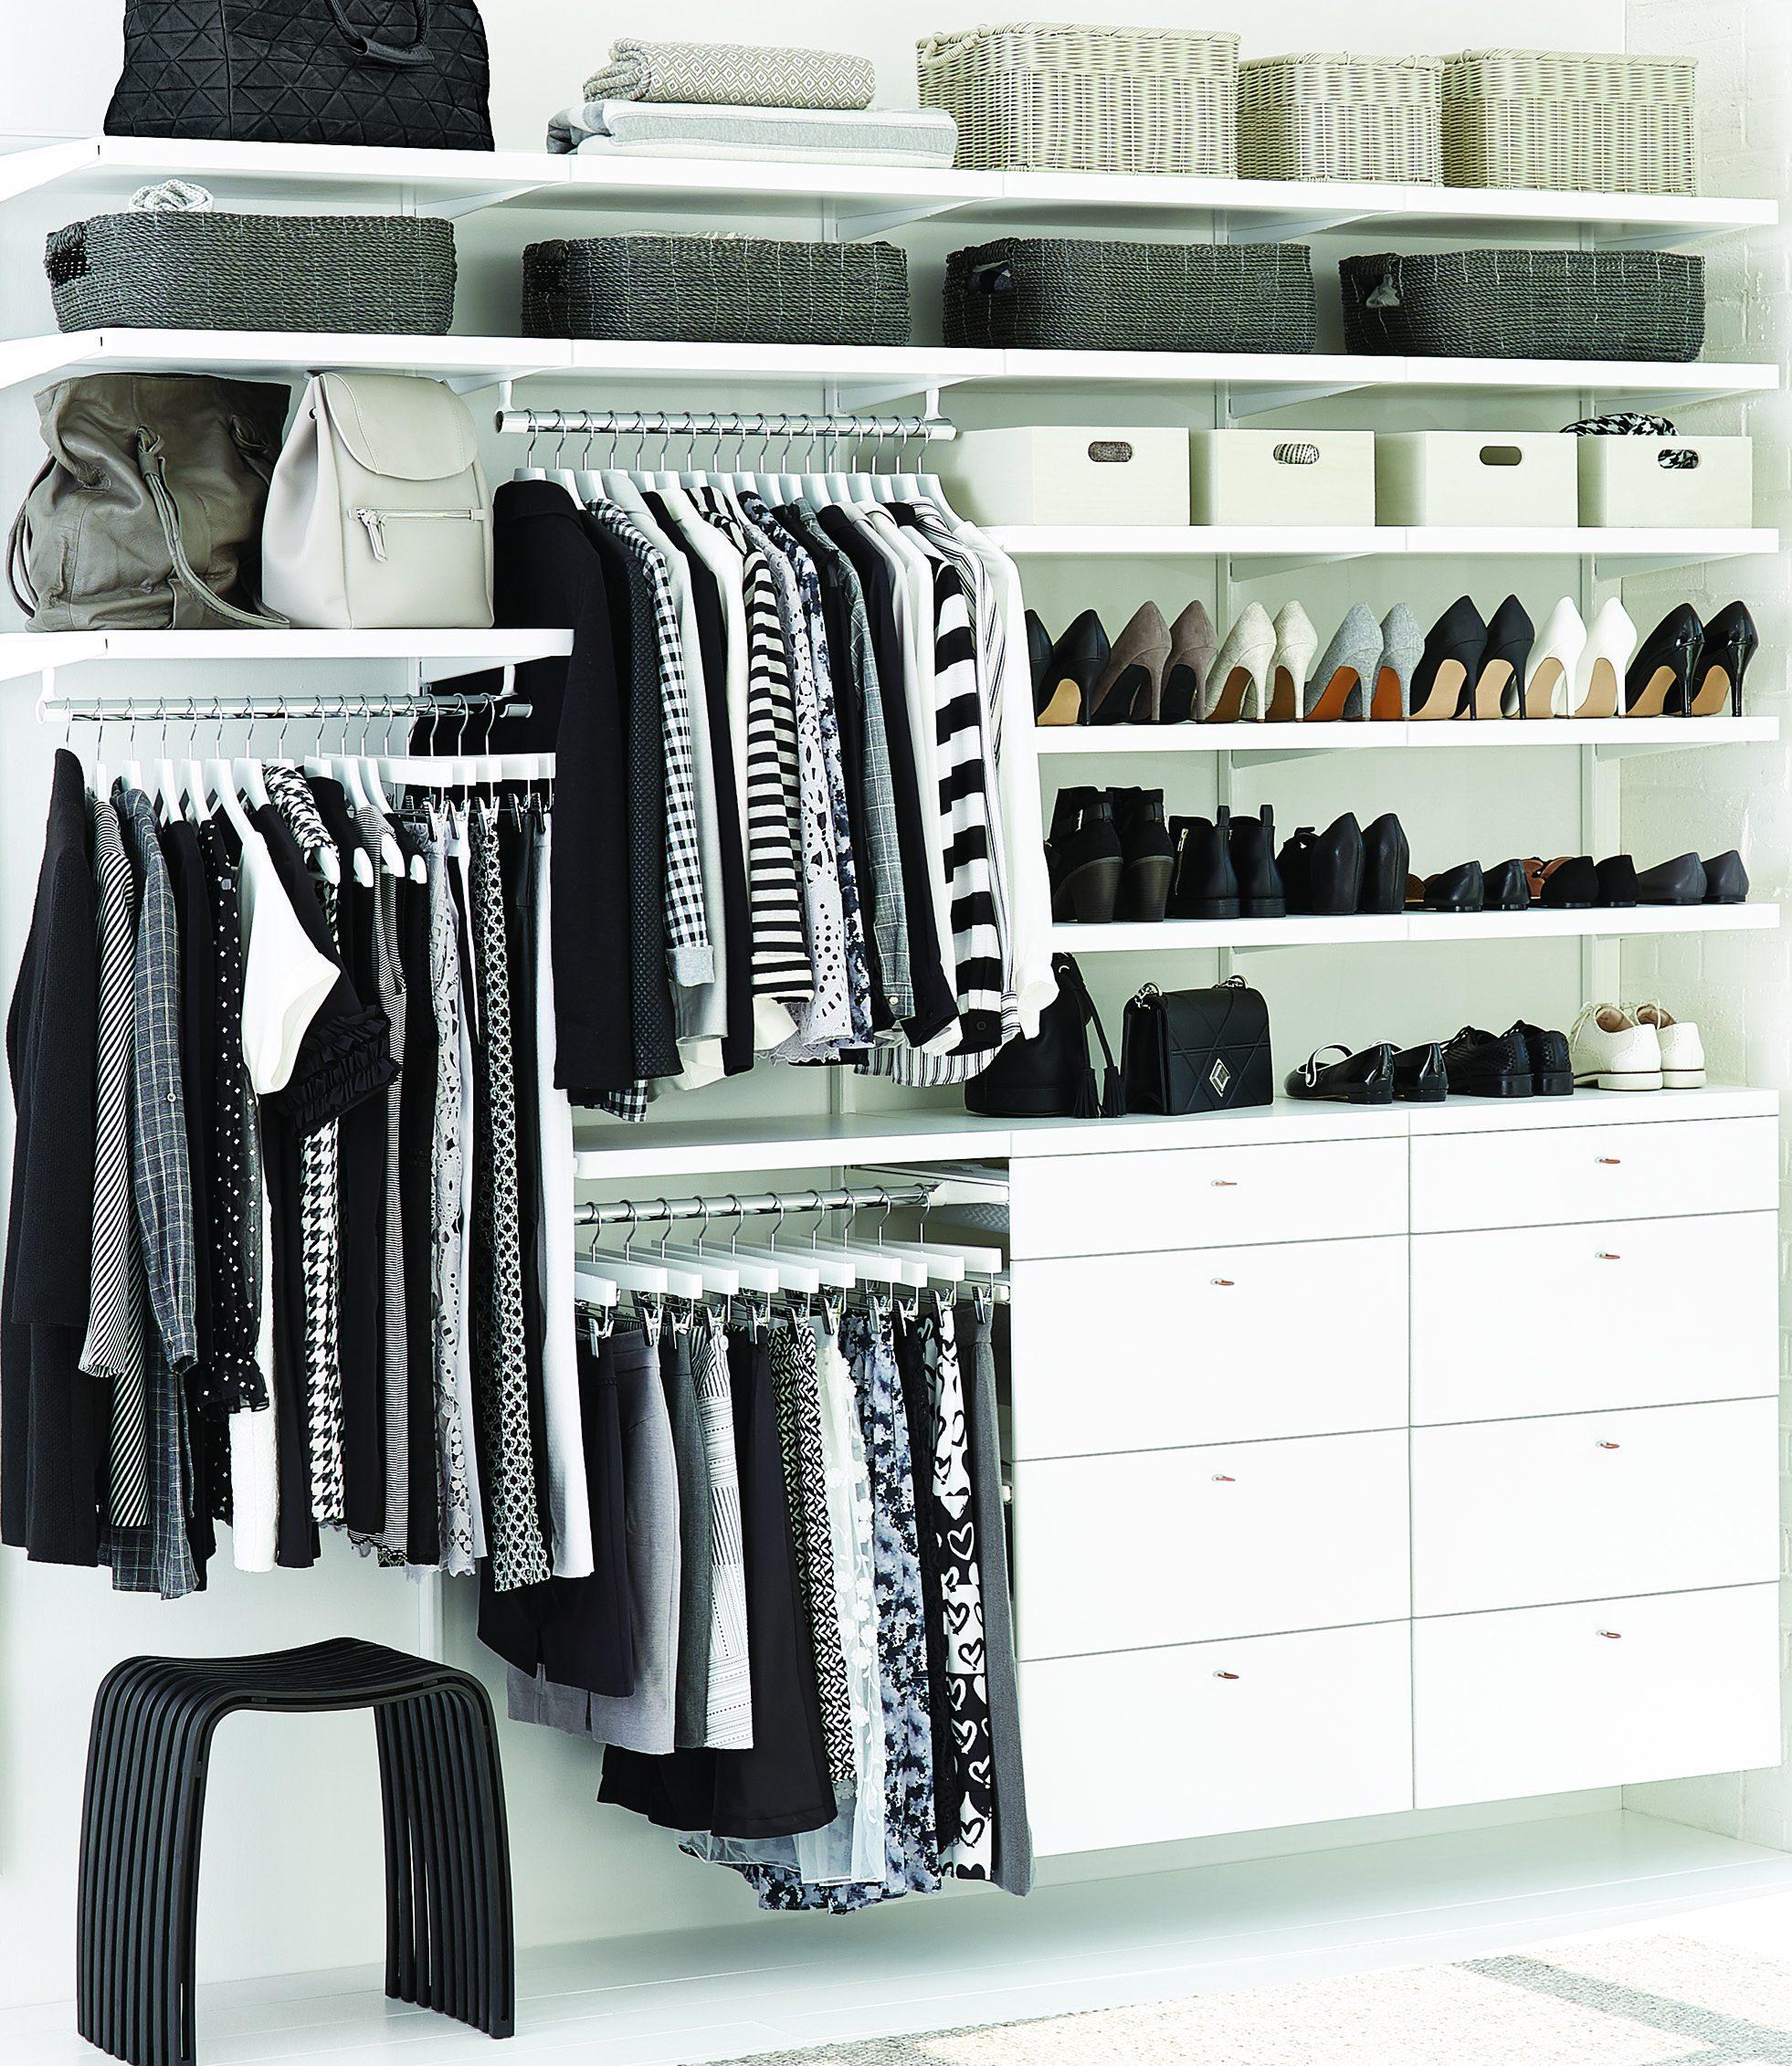 How To Enhance Your Closet Experience Bozzuto